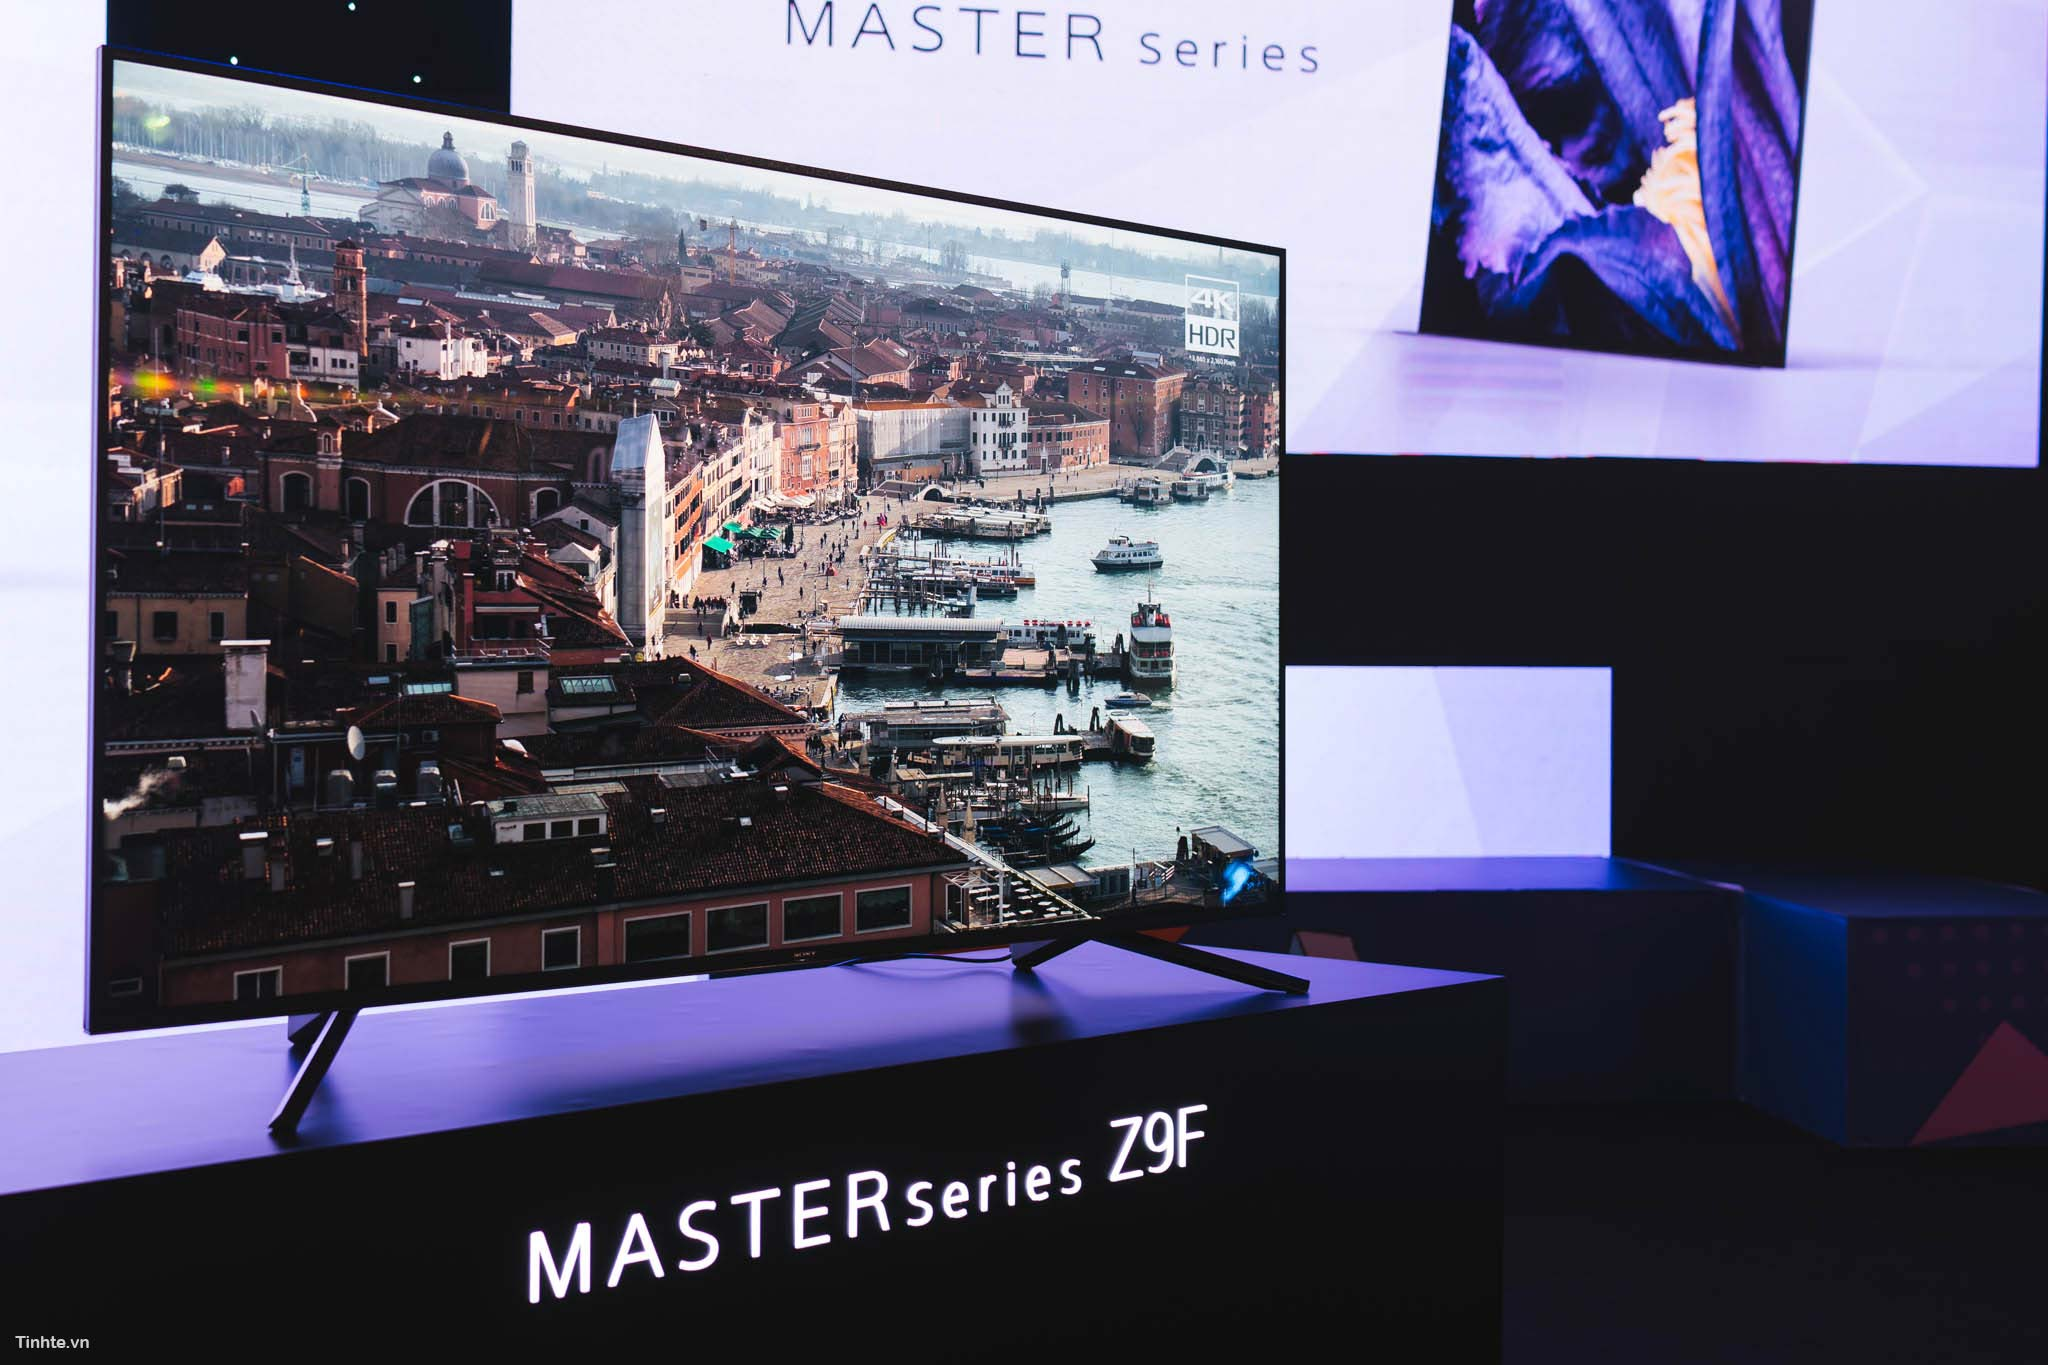 Sony_master_series-1.jpg